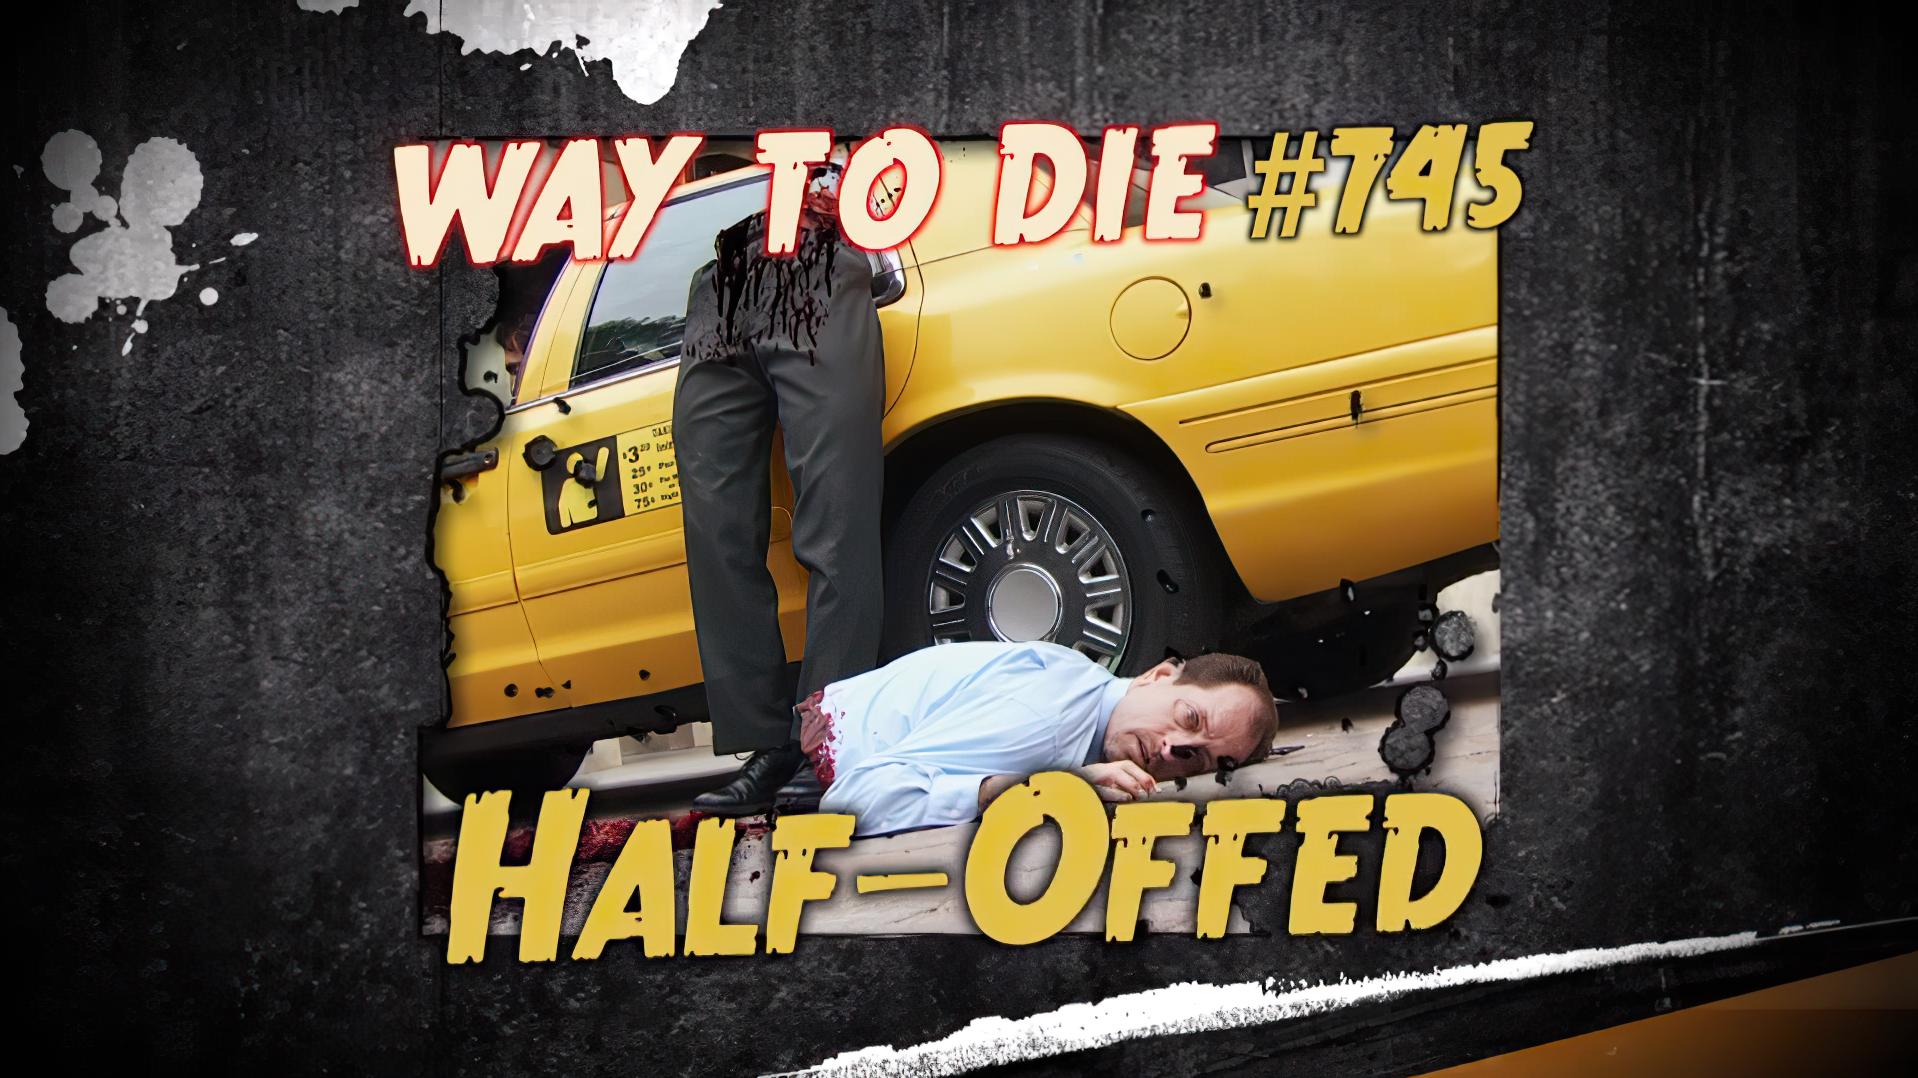 Half-Offed